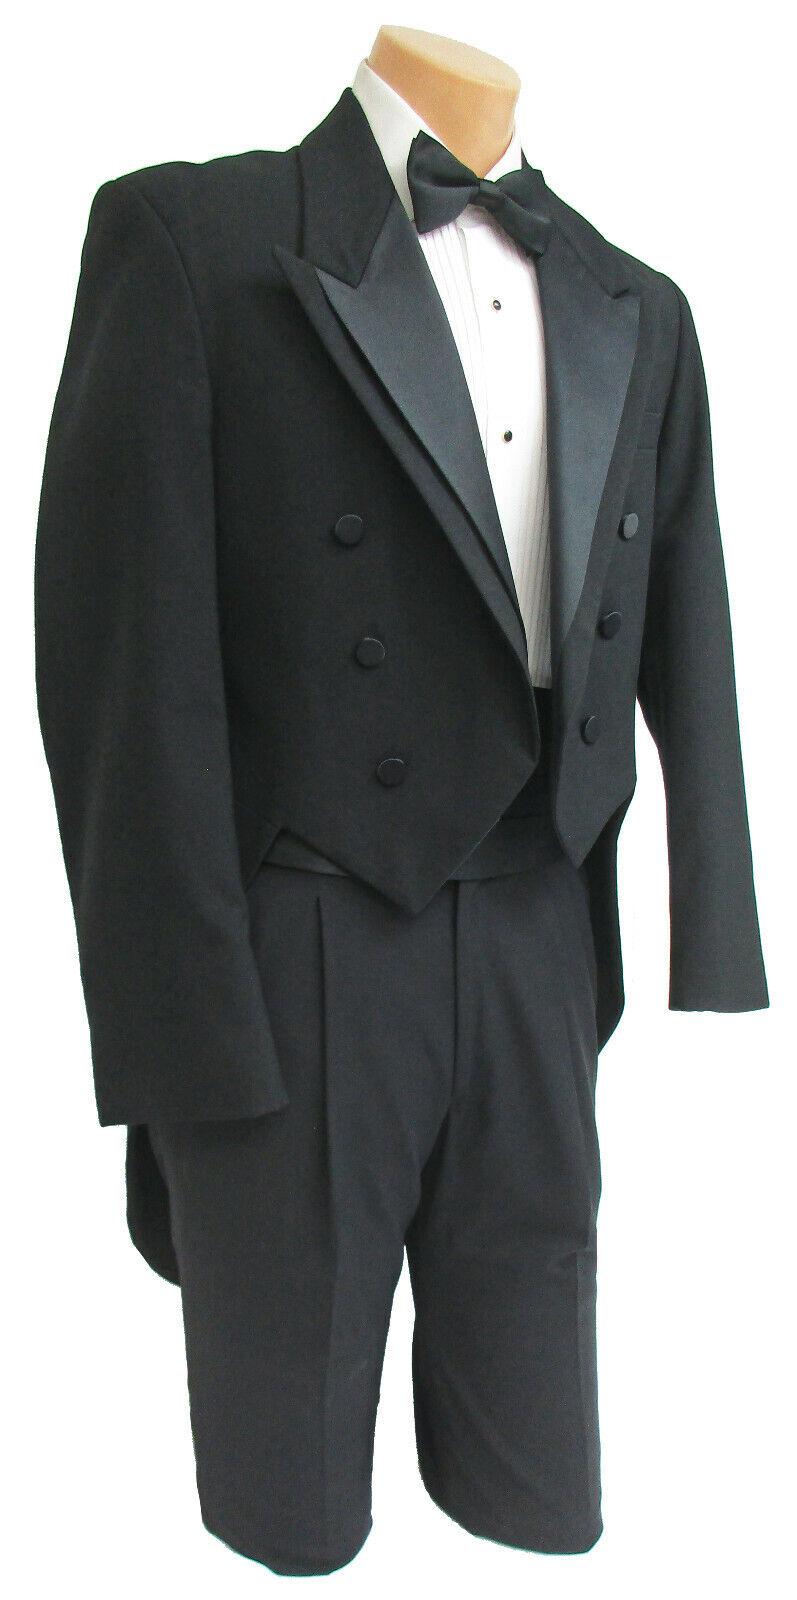 Men's Oscar de la Renta Tuxedo Tailcoat Formal Wedding Mardi Gras Long Tails 37R